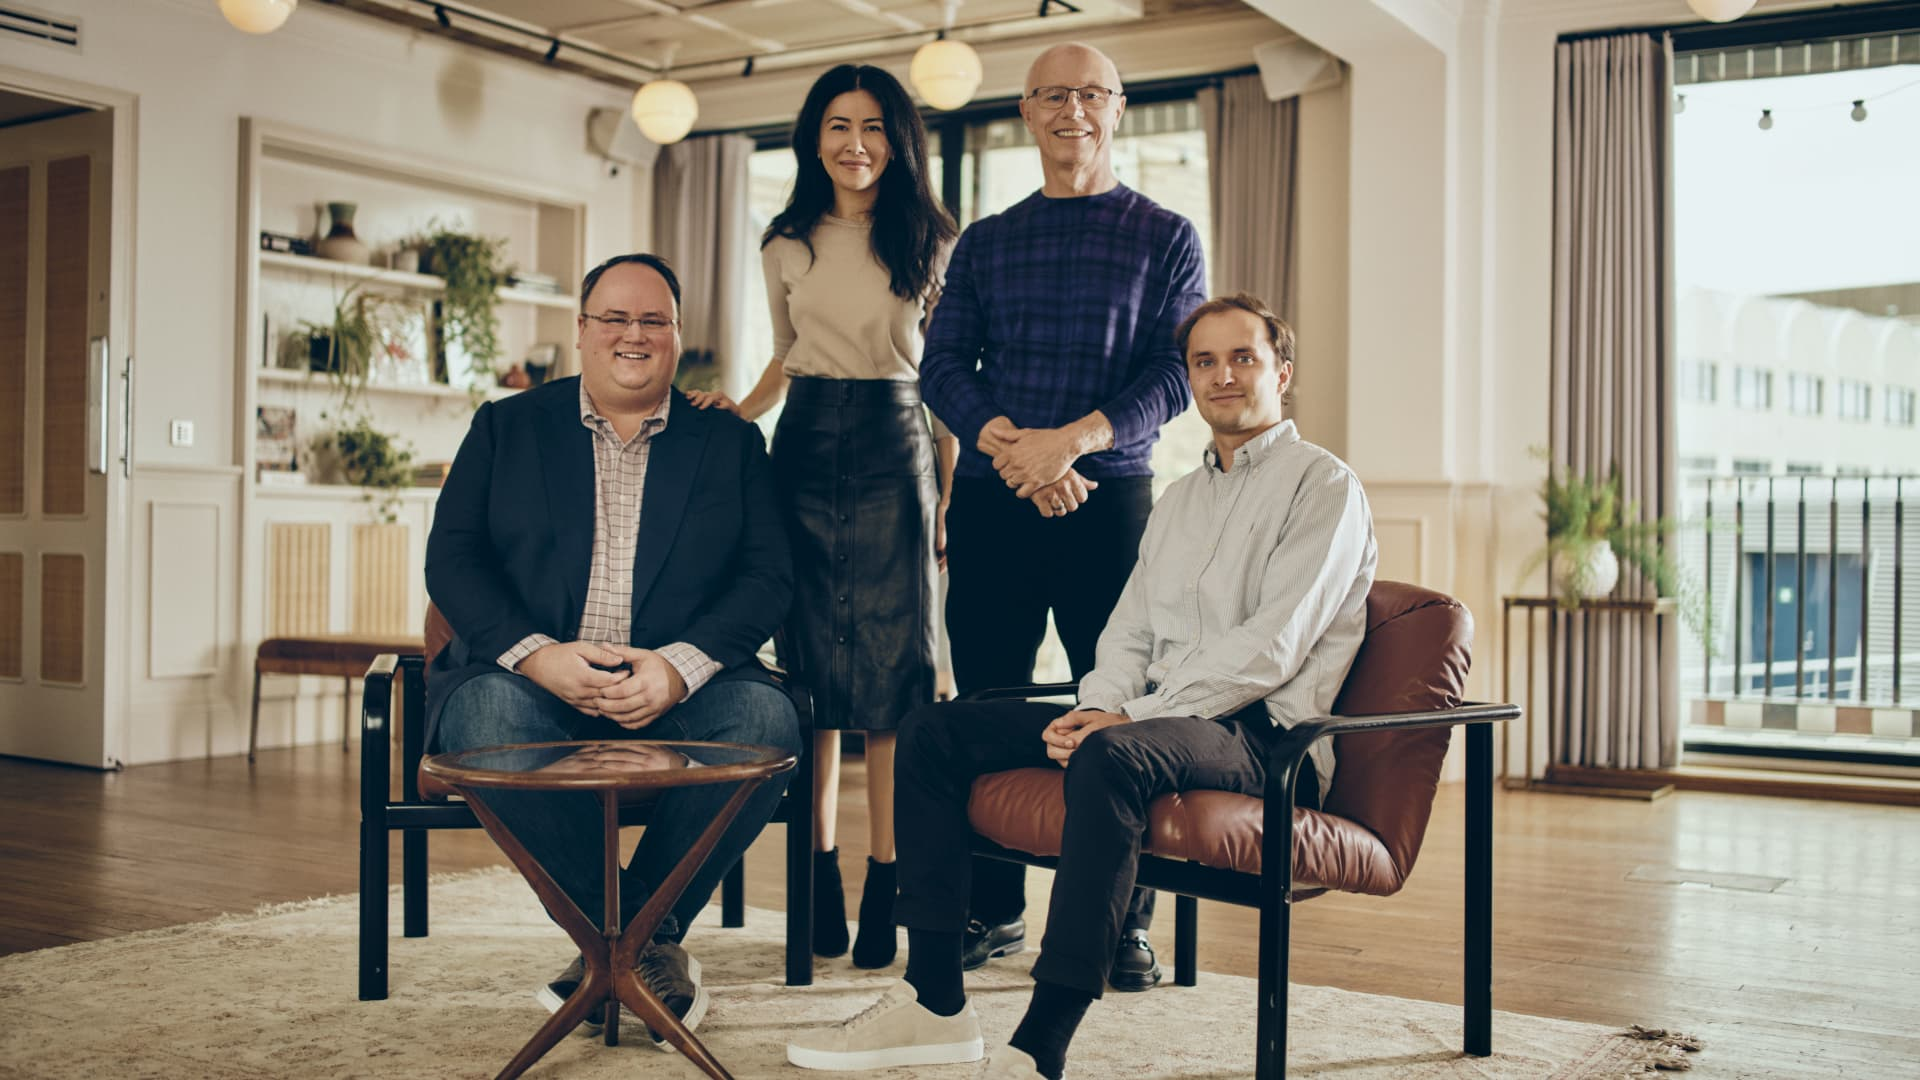 Sequoia investors (L-R): Matt Miller, Luciana Lixandru, Doug Leone, and George Robson.